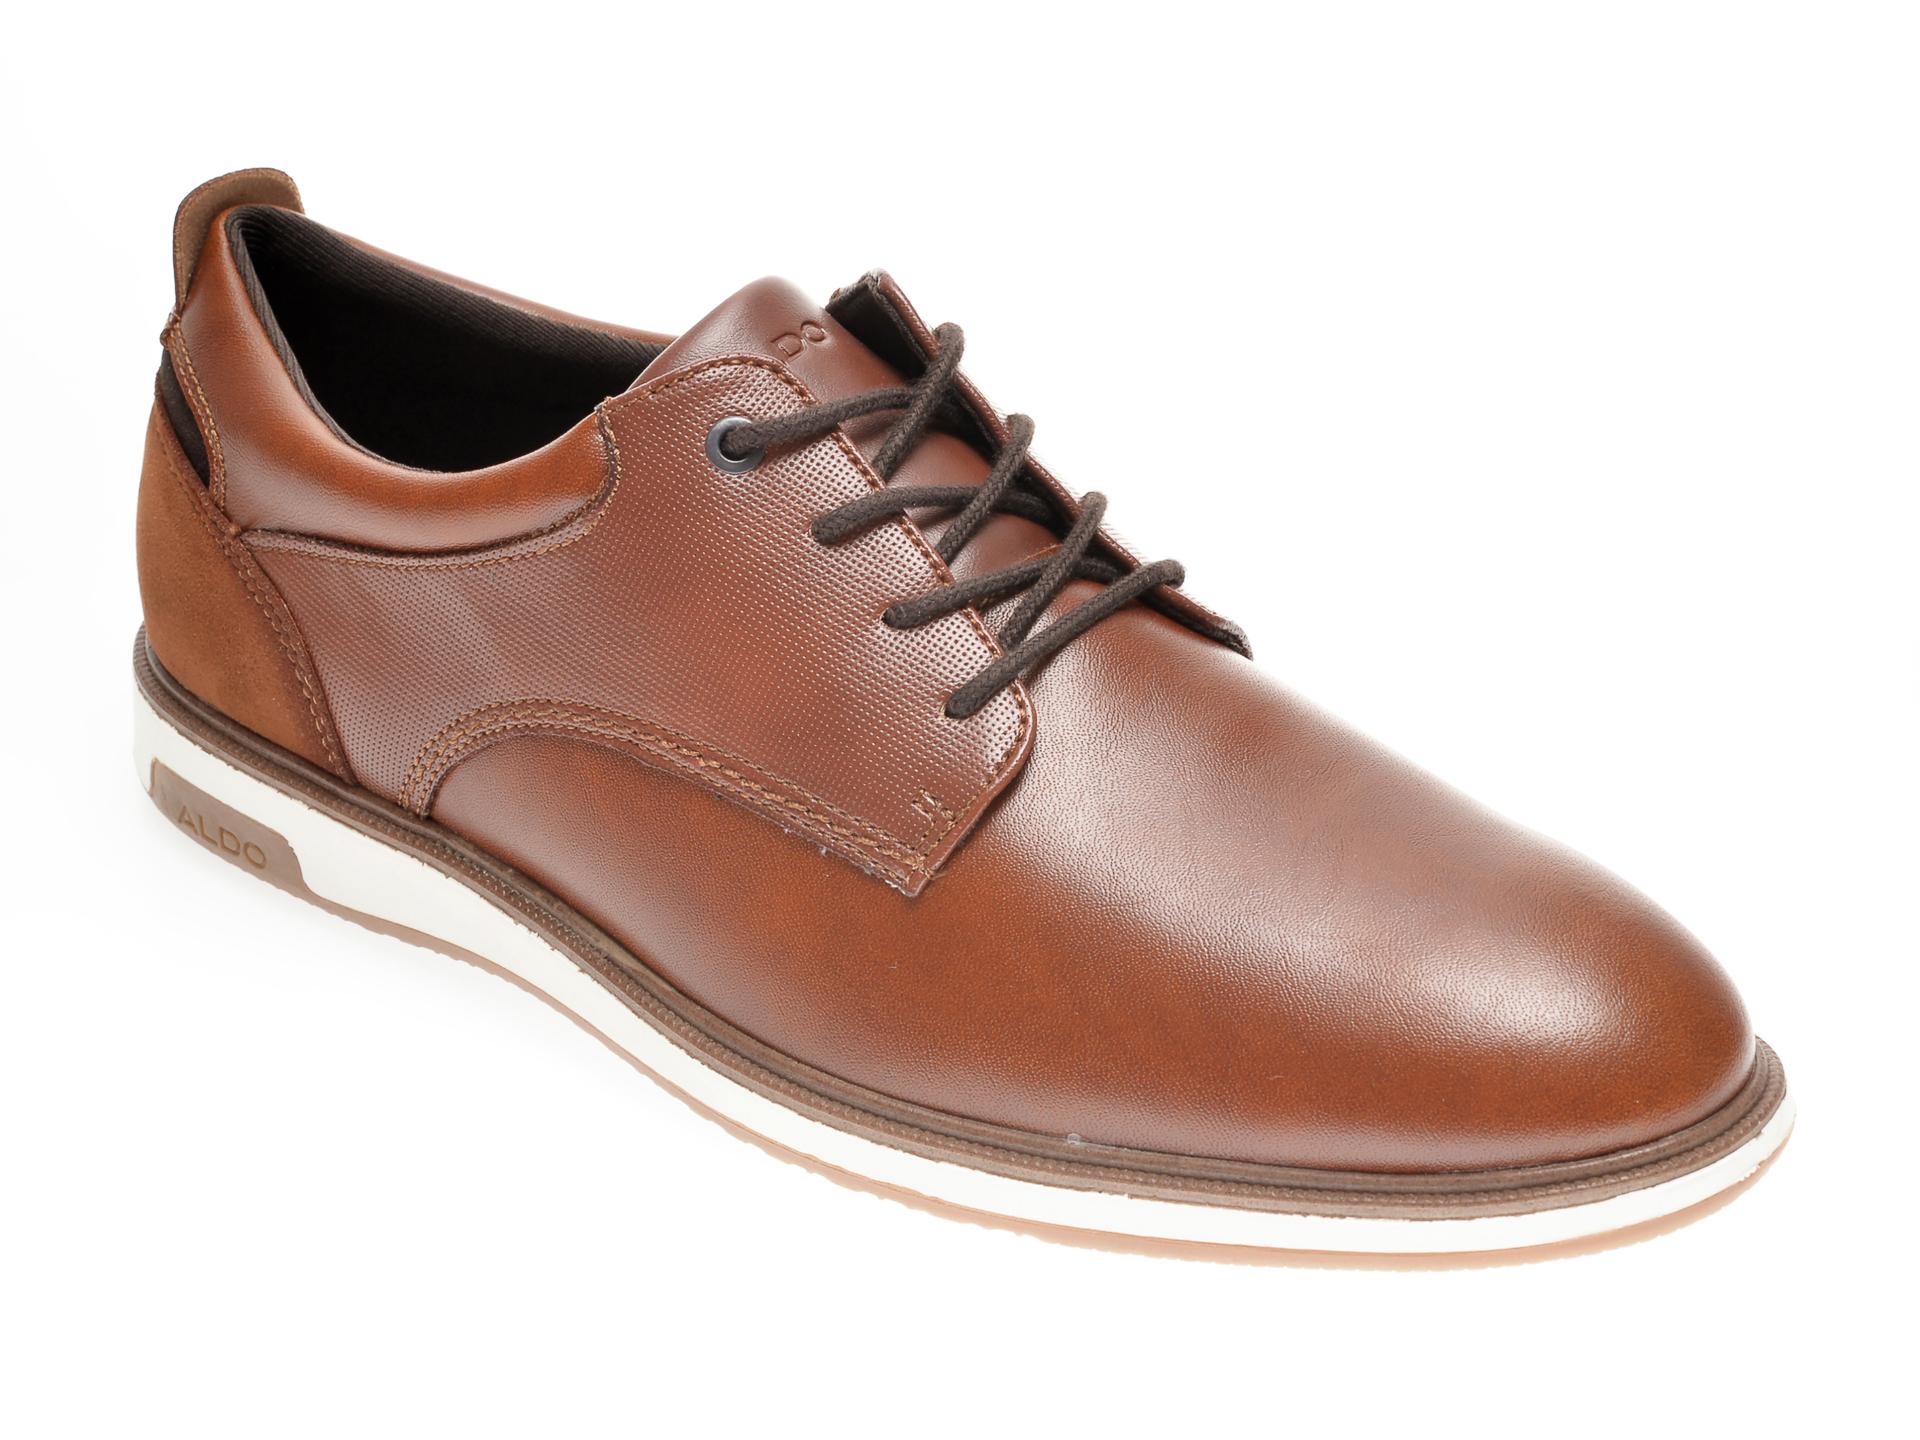 Pantofi ALDO maro, Metropole220, din piele naturala imagine